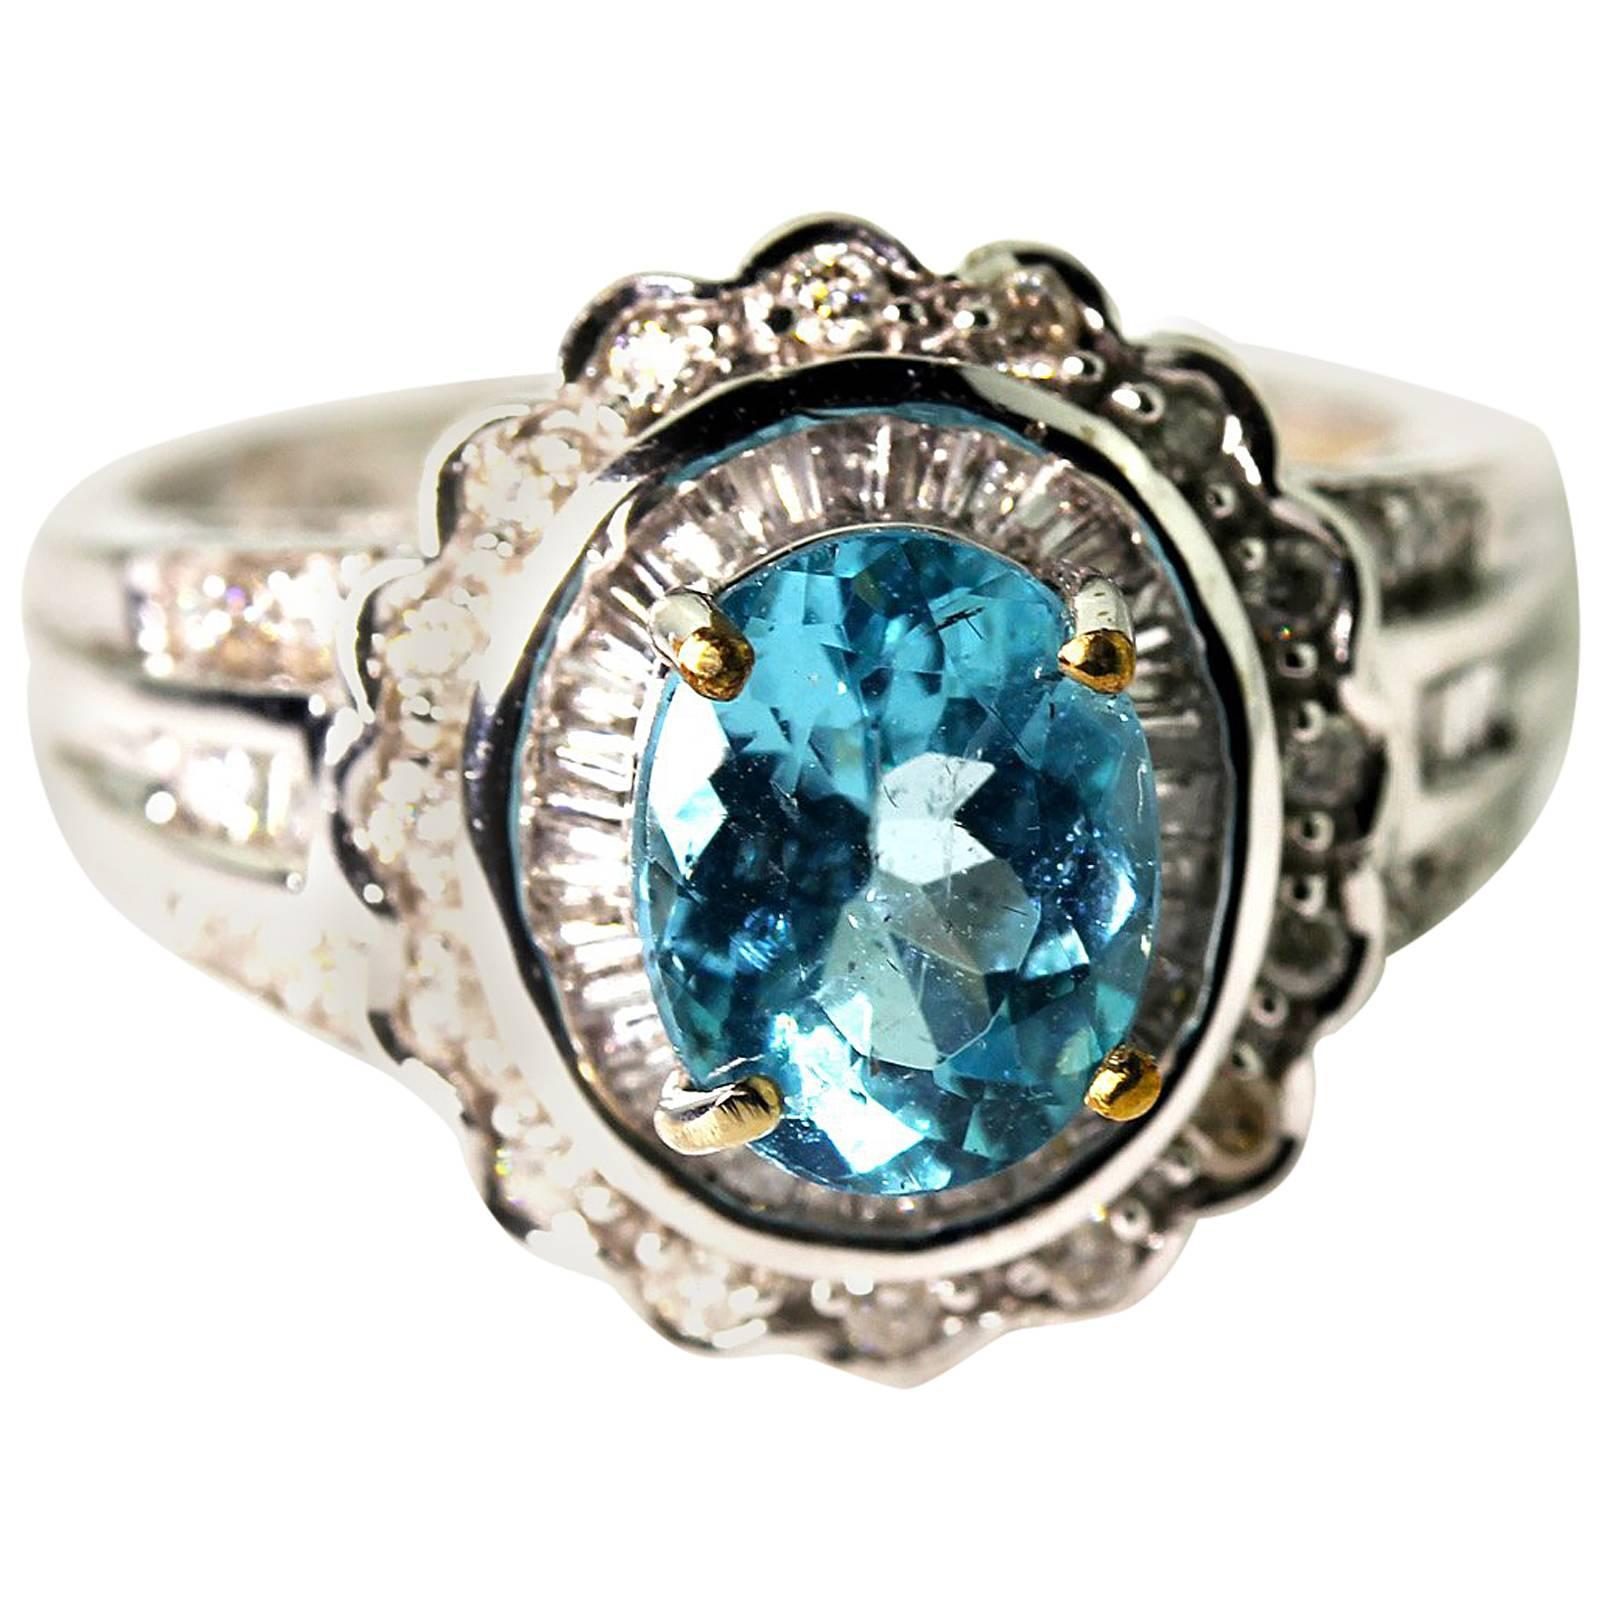 Gemjunky Lovely Petite 1.3 Ct Oval Blue Apatite & Diamond 10KT Gold Ring